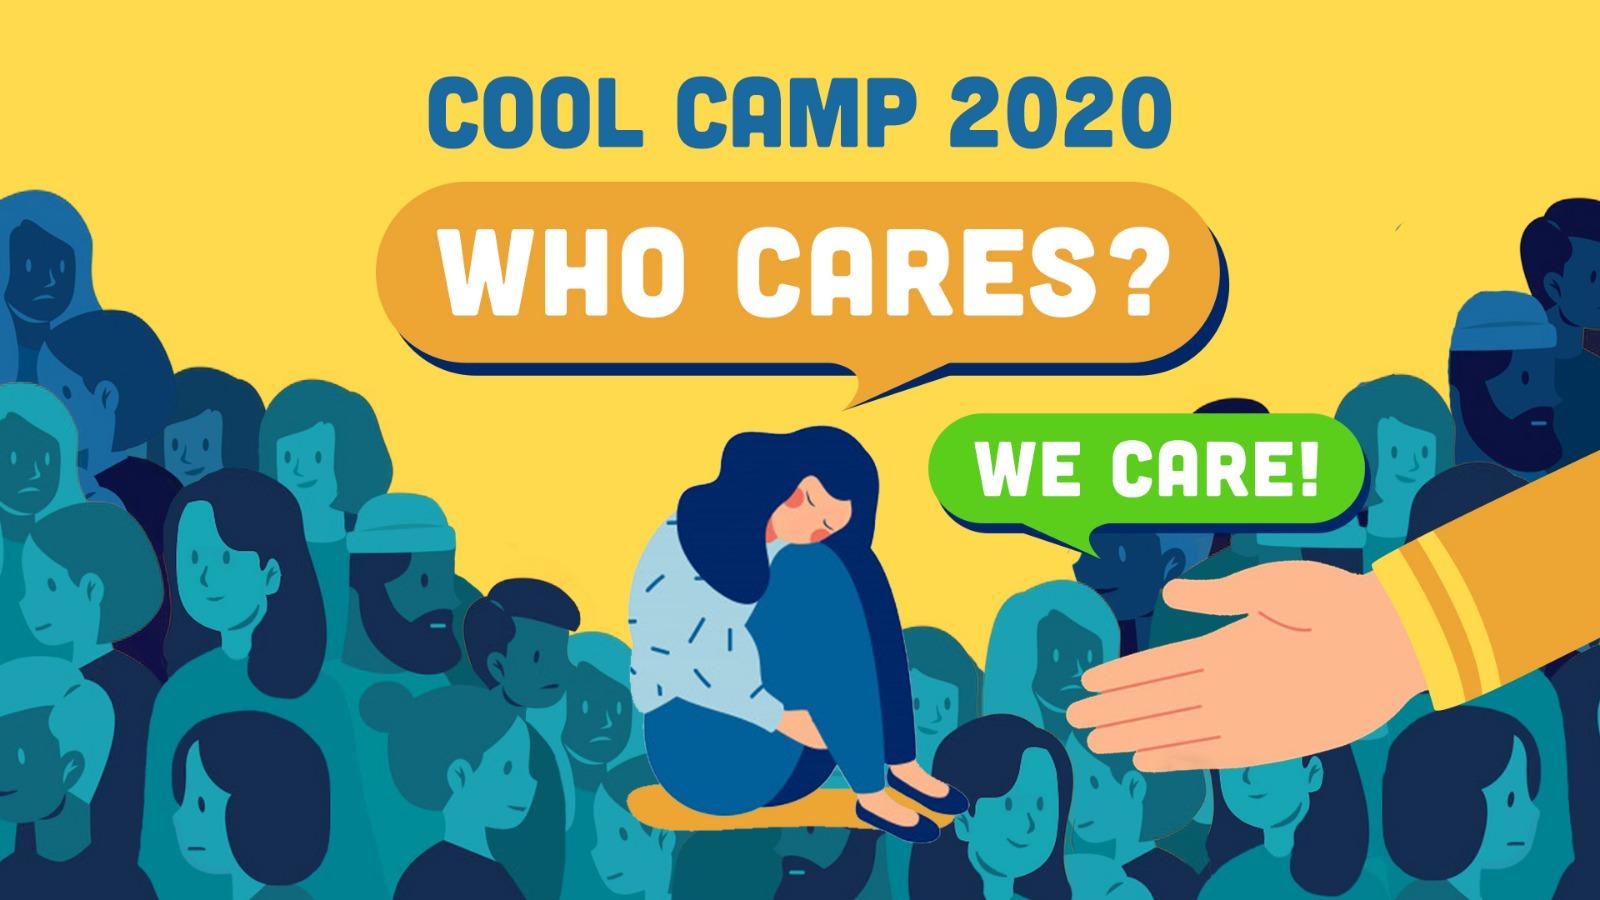 Cool Camp 2020